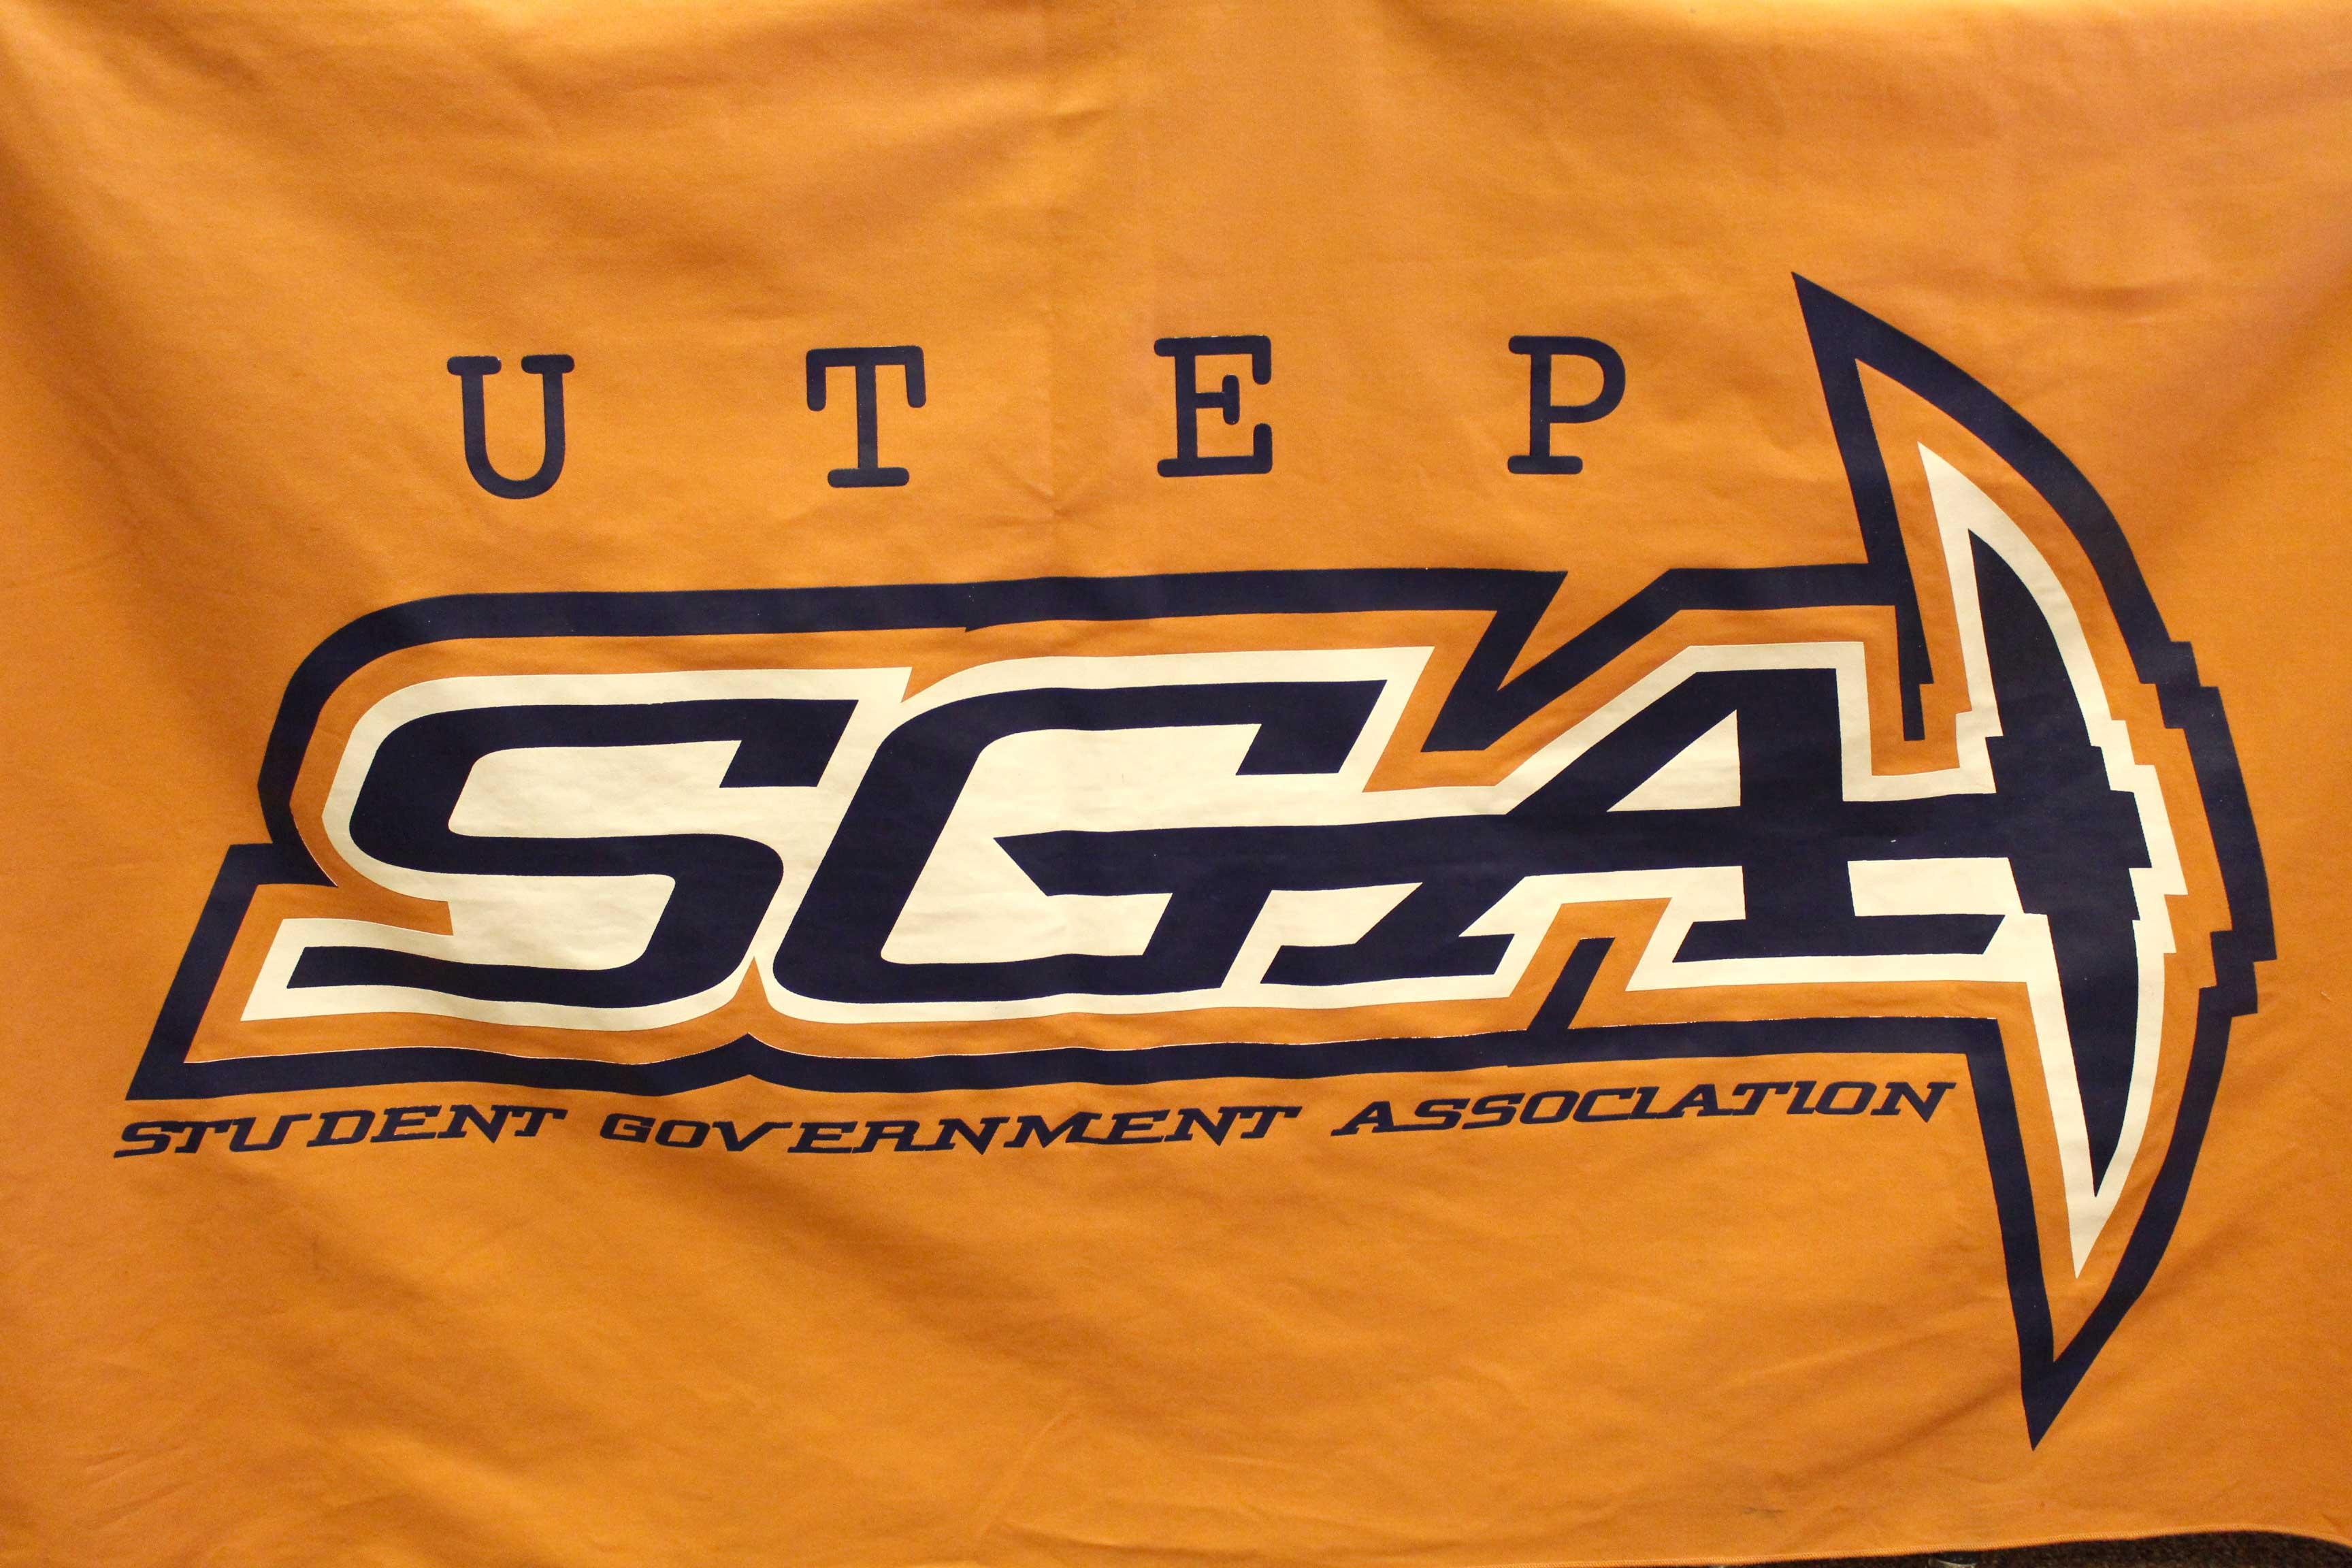 The UTEP SGA banner.